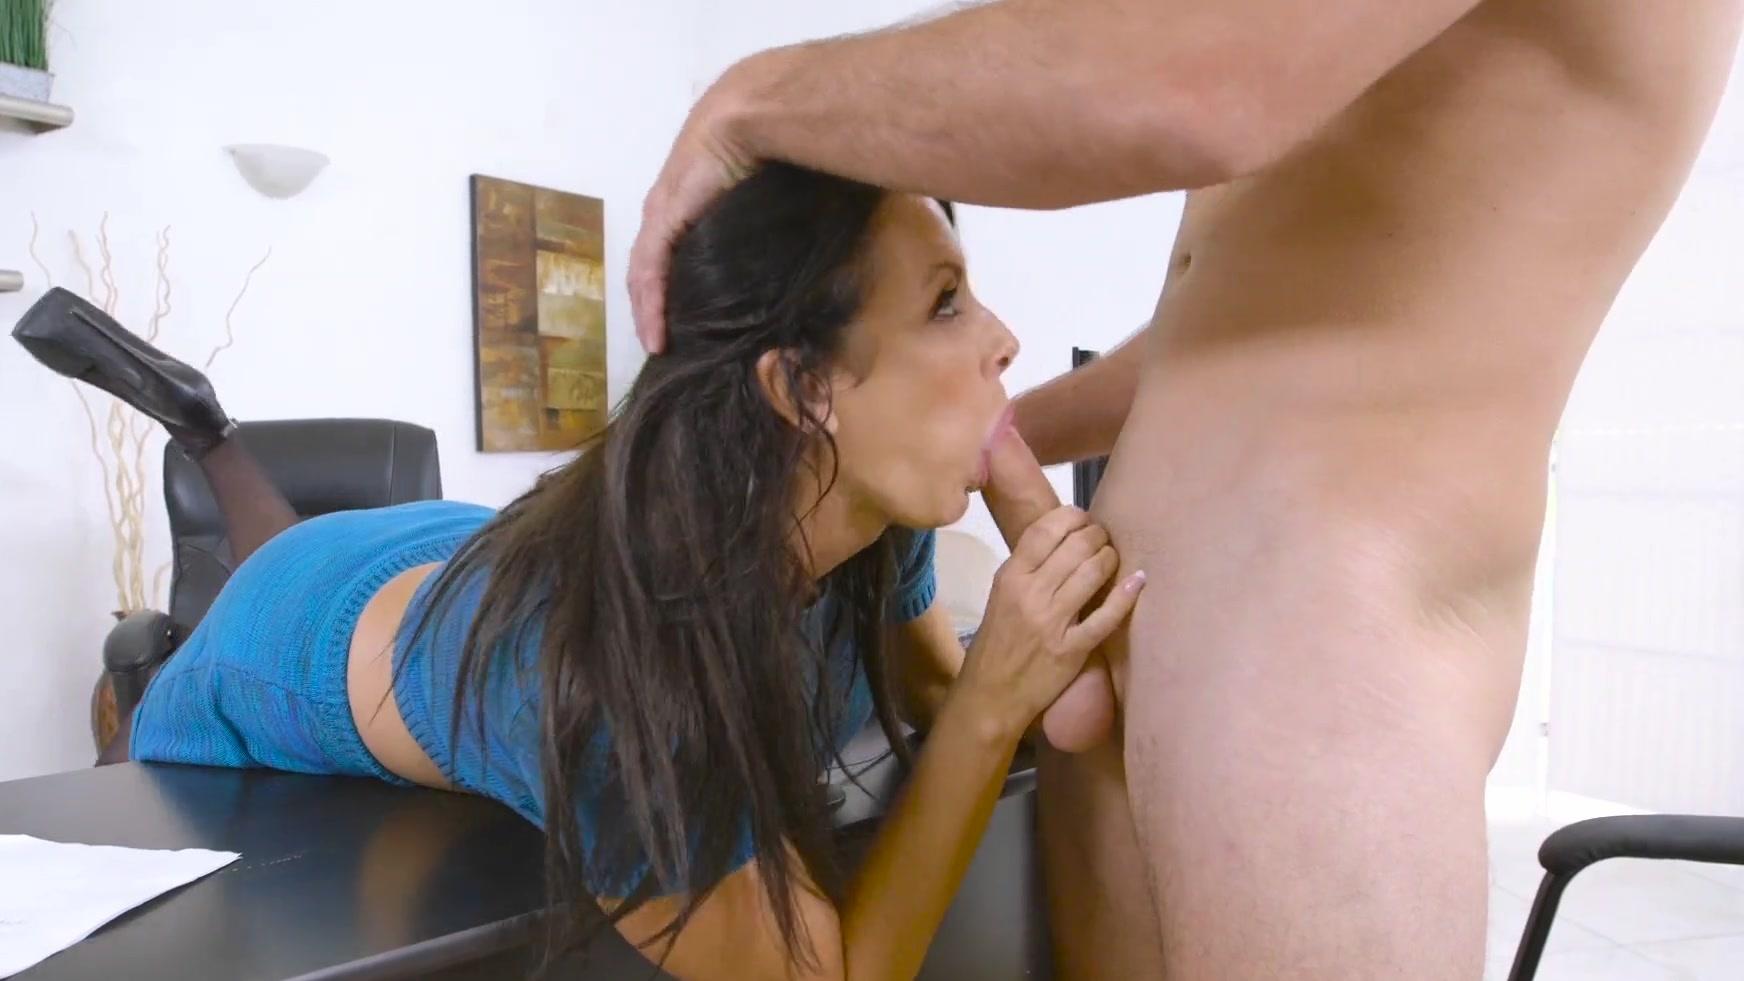 Jule recommends Masturbation in ecstasy